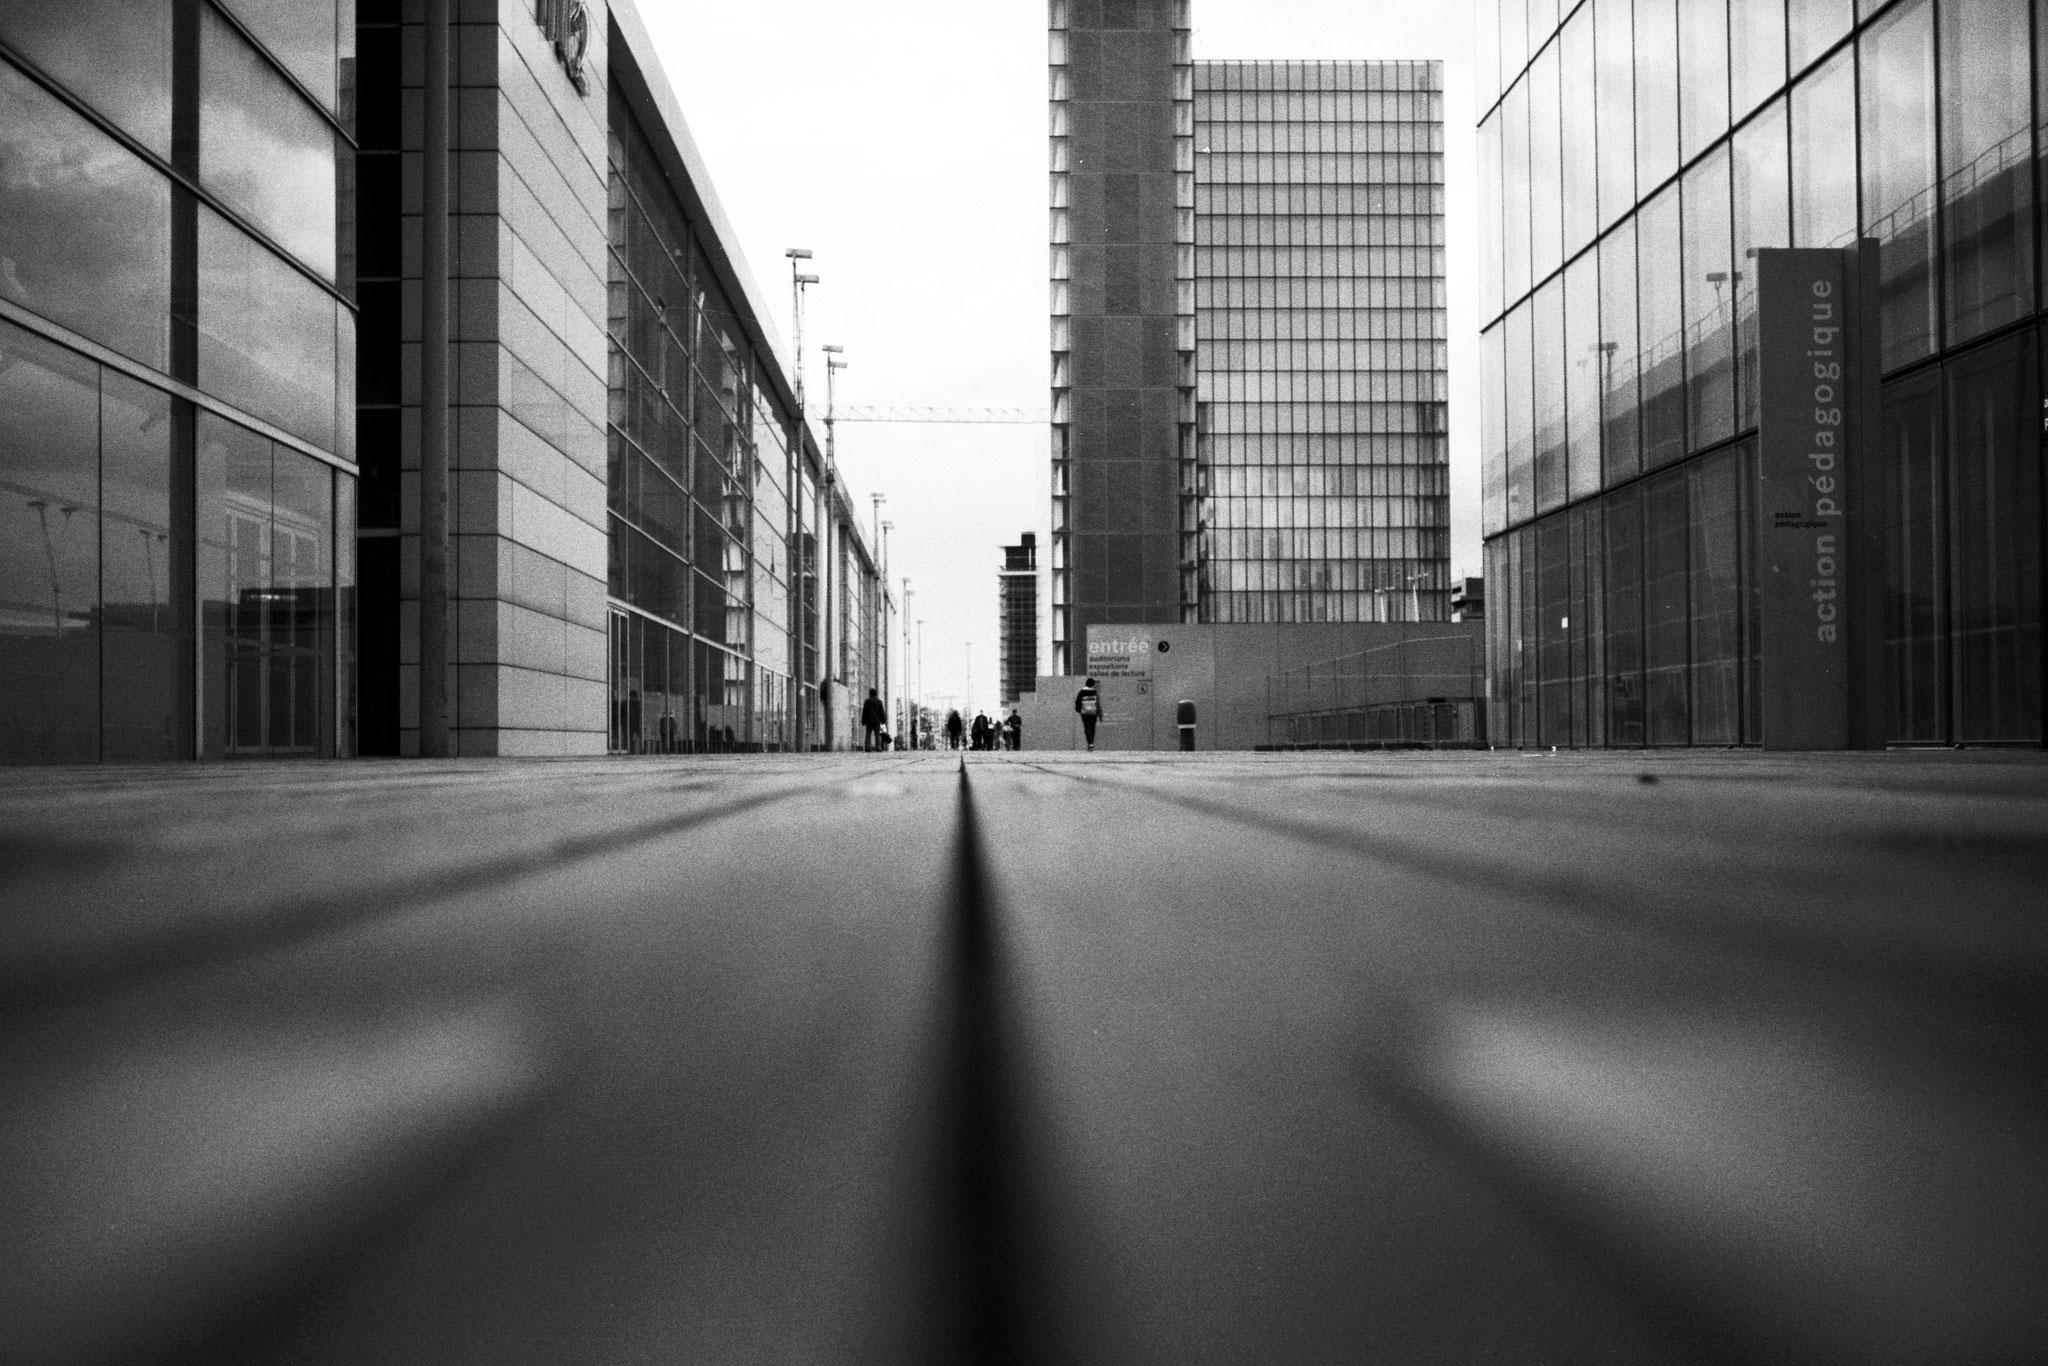 """Floor and lines"" - Bibliothèque François Mitterand, Paris (2021). Kodak T-Max 100 ASA. © Clémence Rougetet"